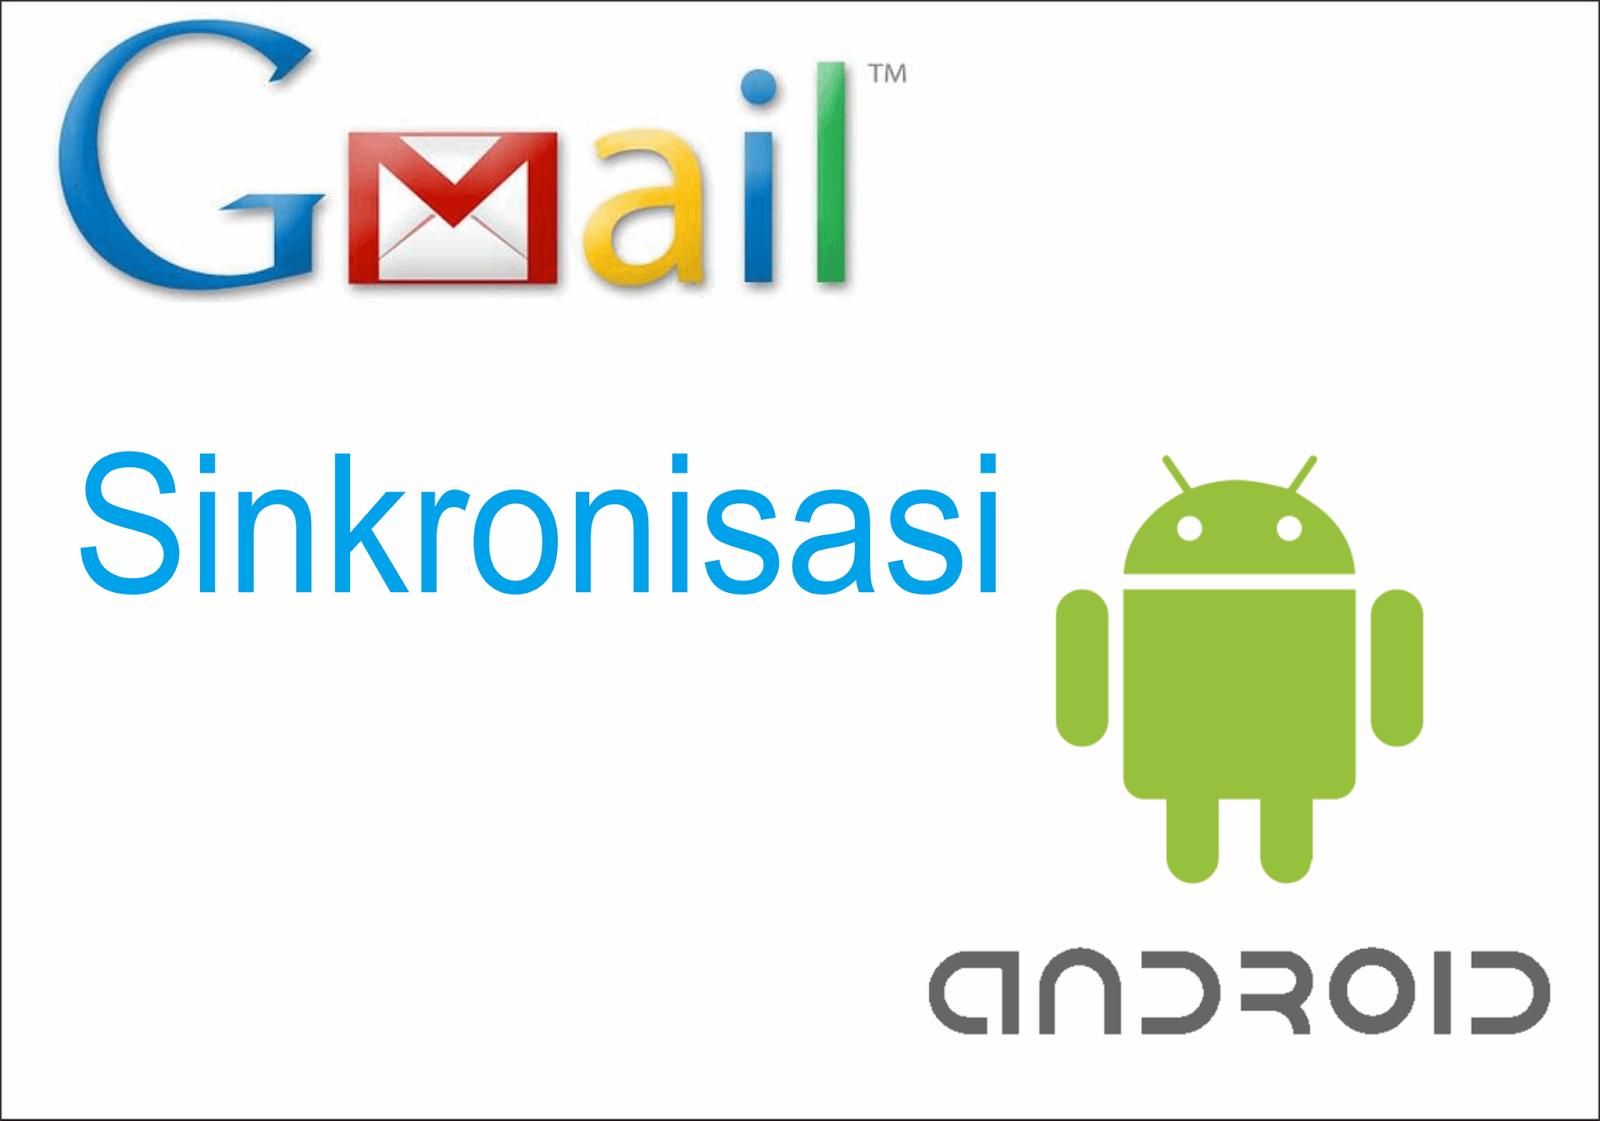 Hasil gambar untuk cara mengatasi gangguan pada gmail